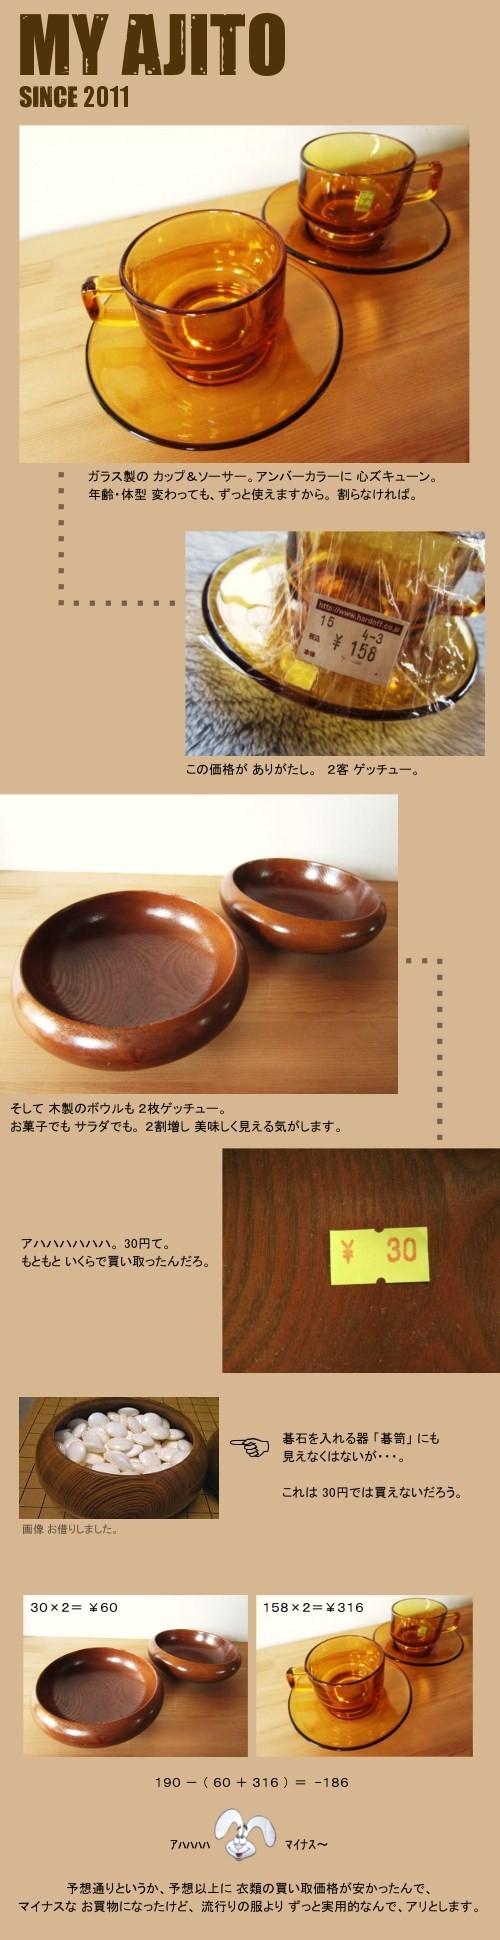 recy_03.jpg